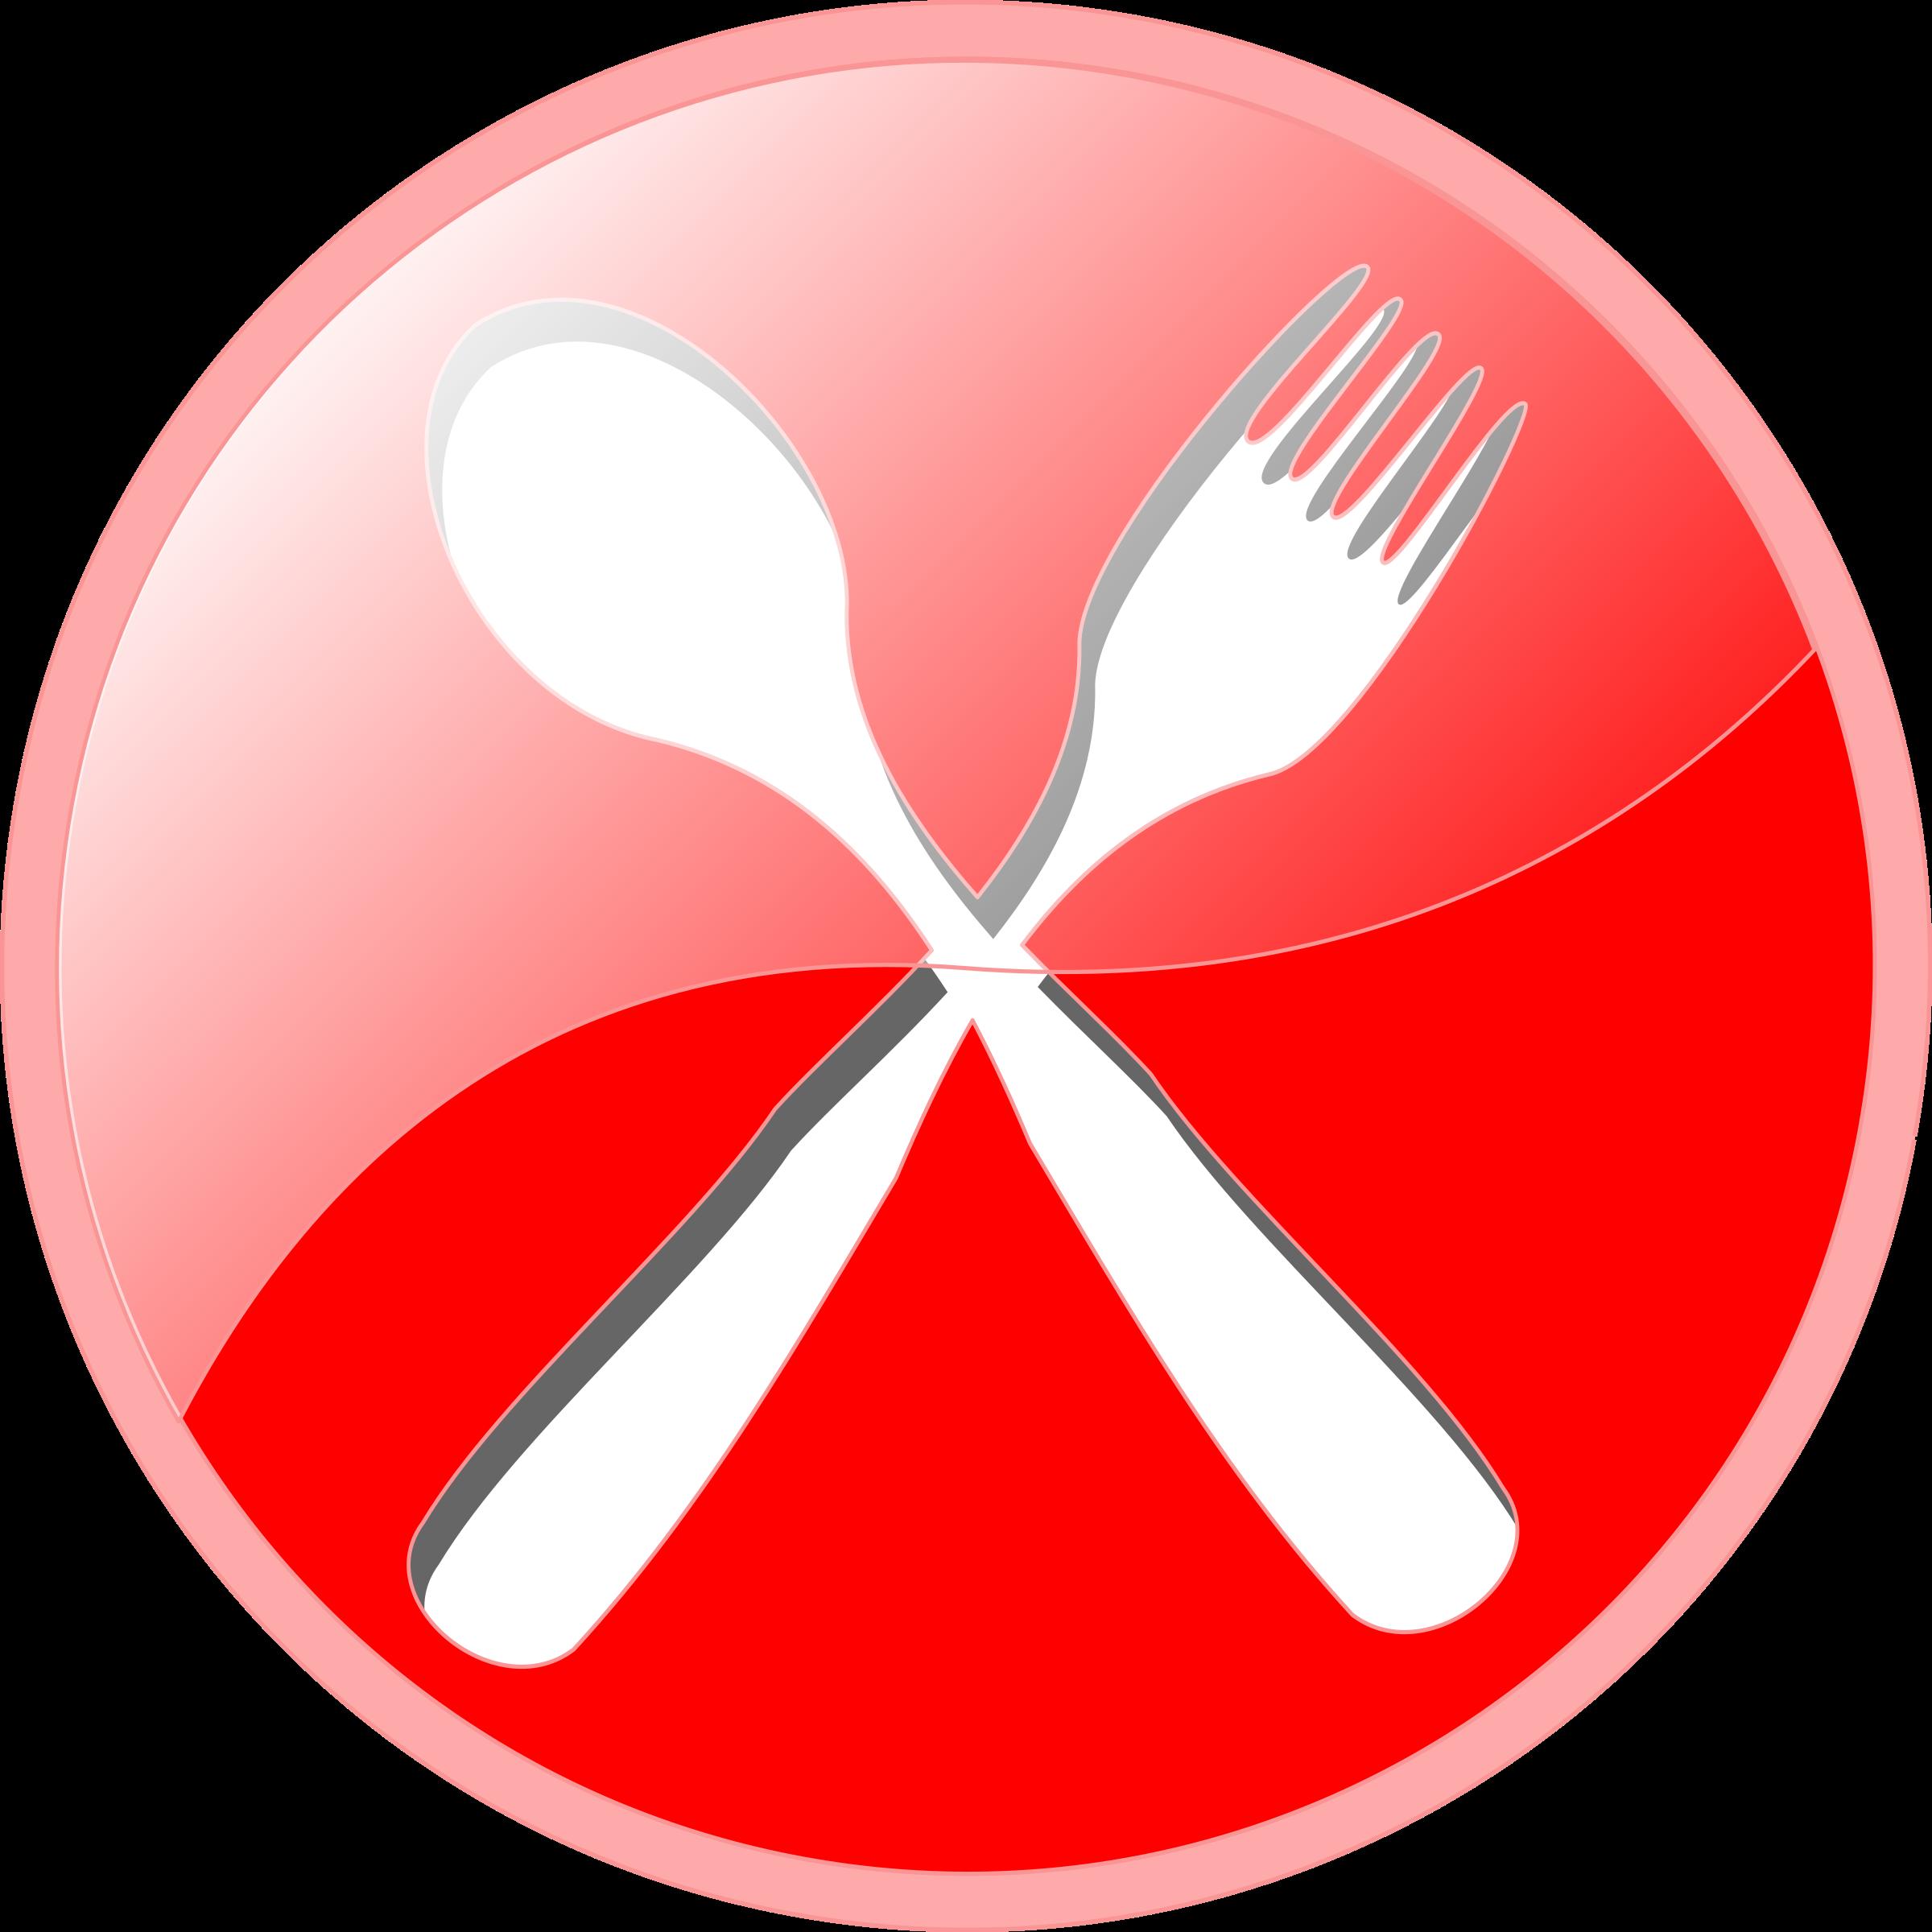 Restaurant big image png. Restaurants clipart spoon fork